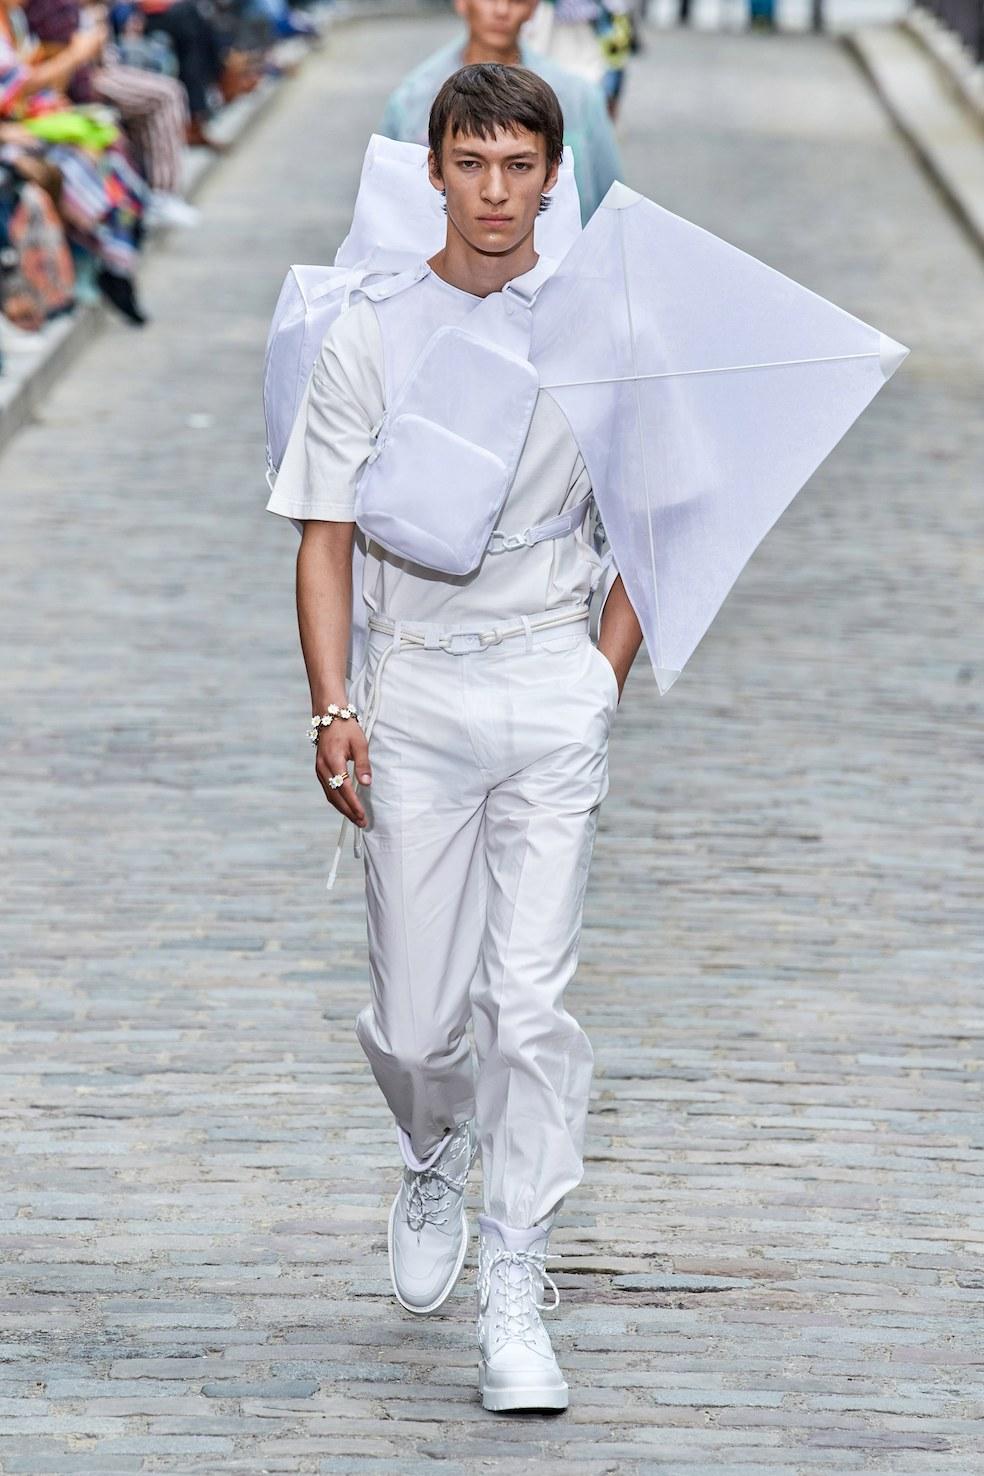 Louis_Vuitton_SS20_Behind_The_Blinds_Magazine__FIO0631.jpg